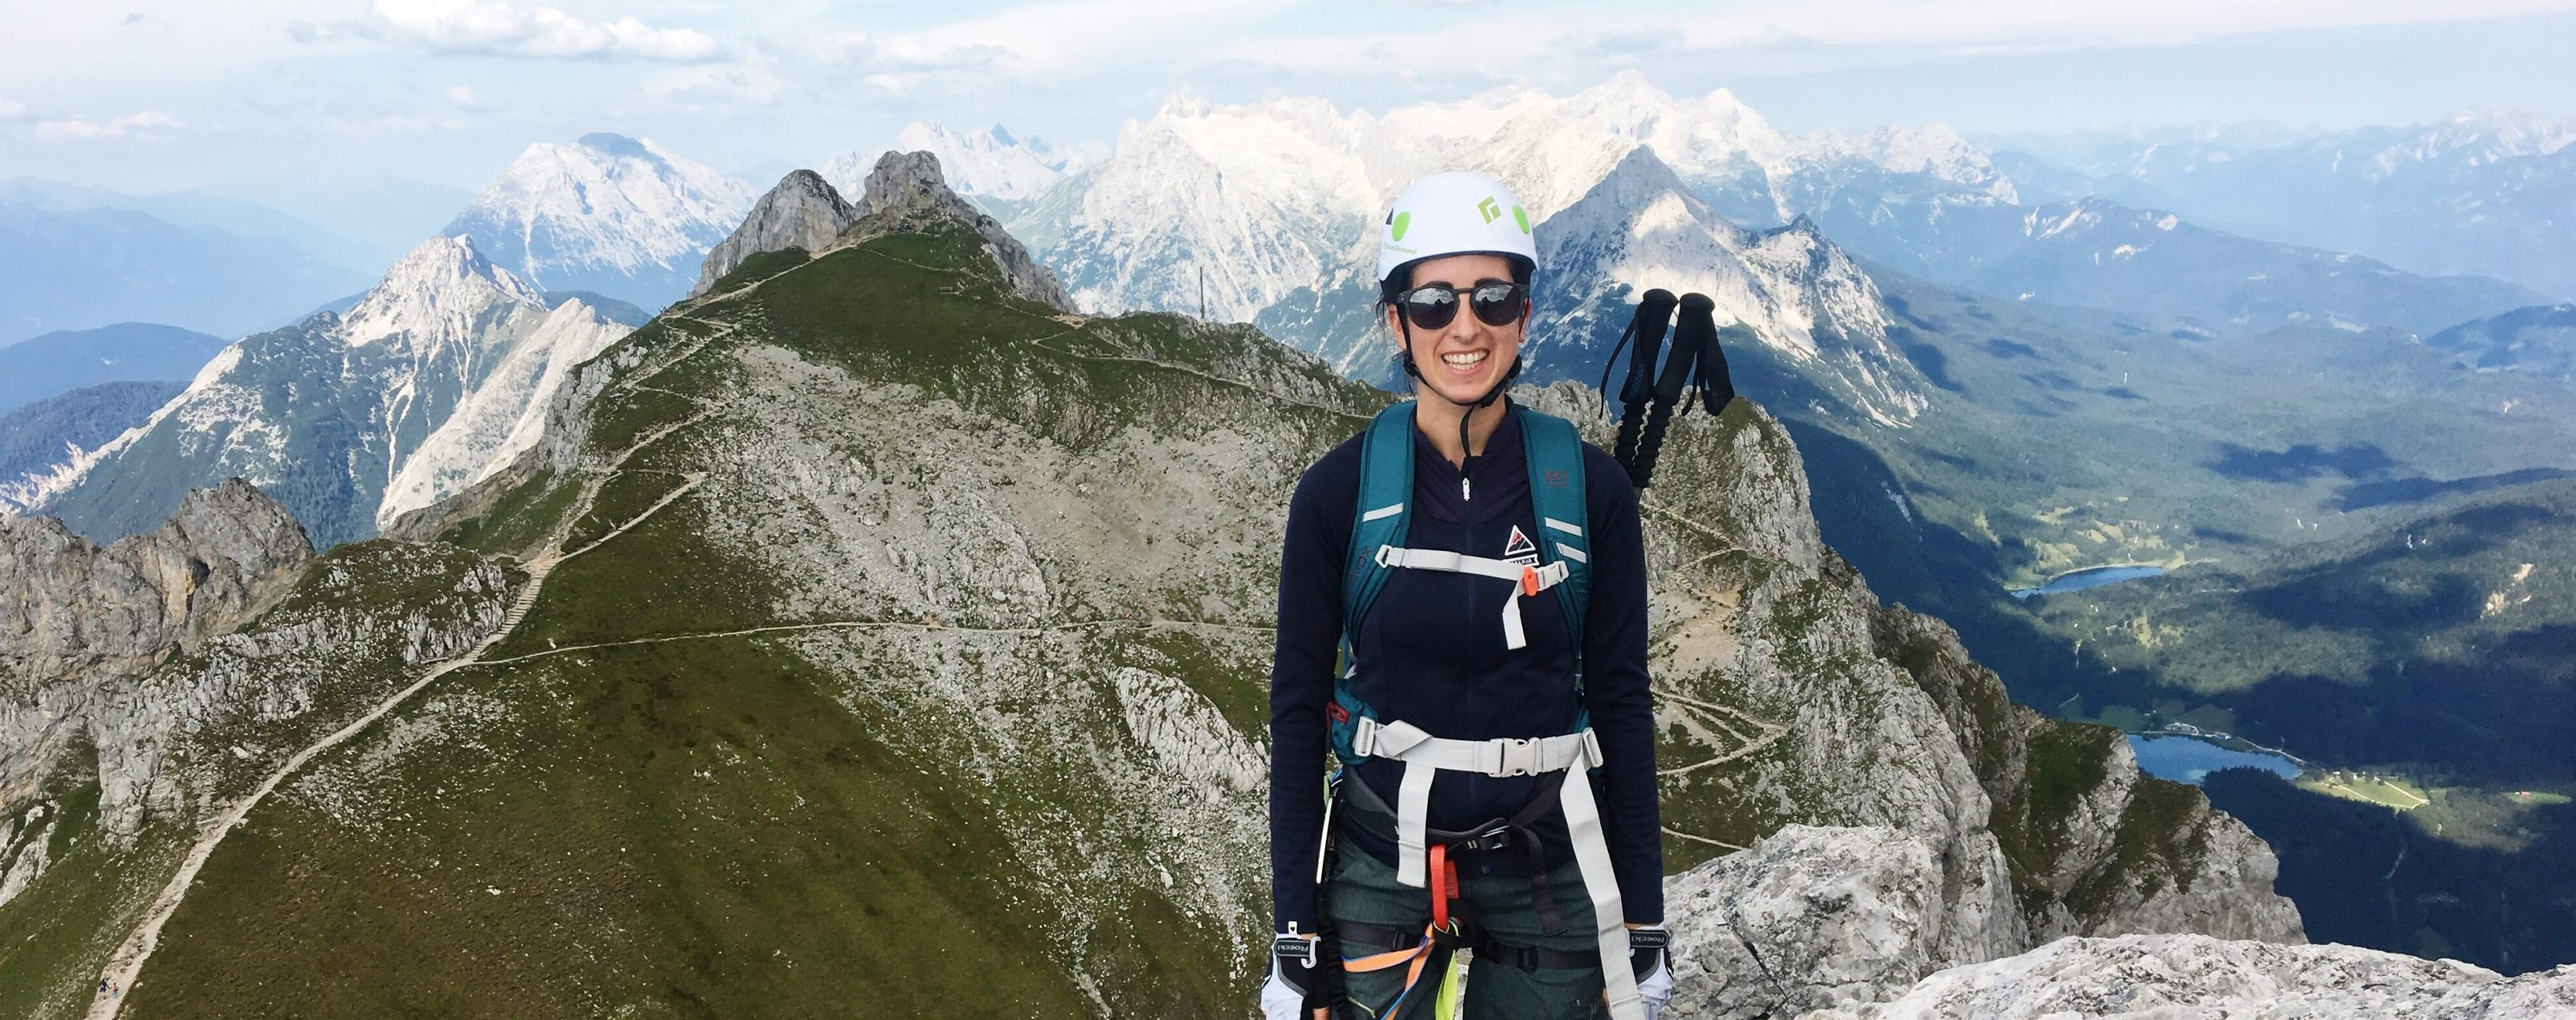 Munich Mountain Girl Eva Beuter in den Bergen